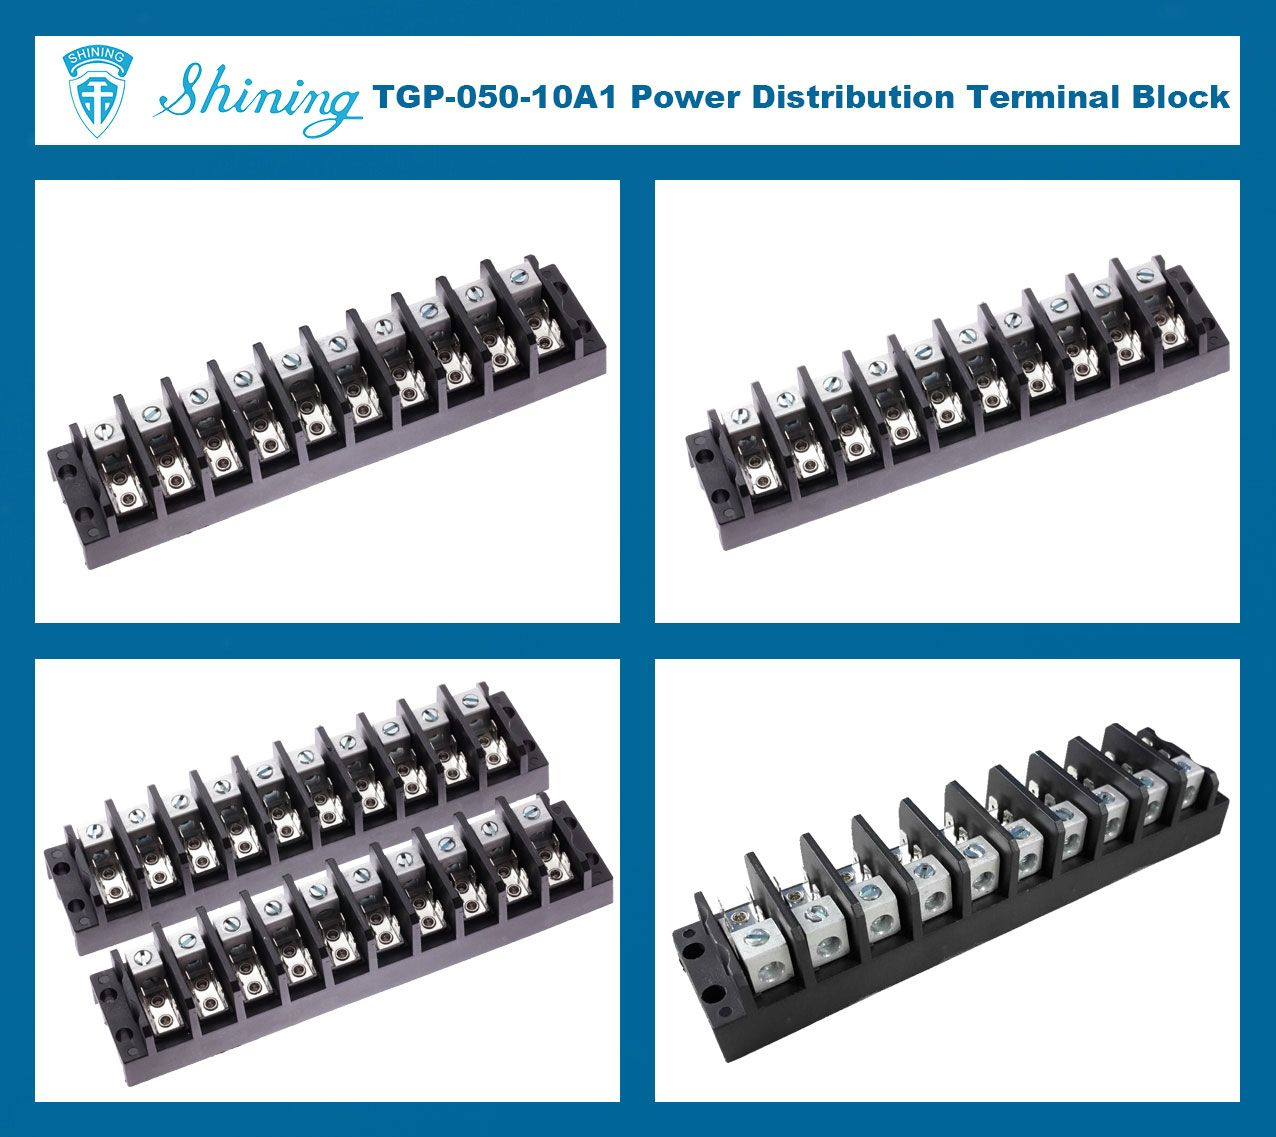 TGP-050-10A1 600V 50A 10 Pole Electrical Power Terminal Block